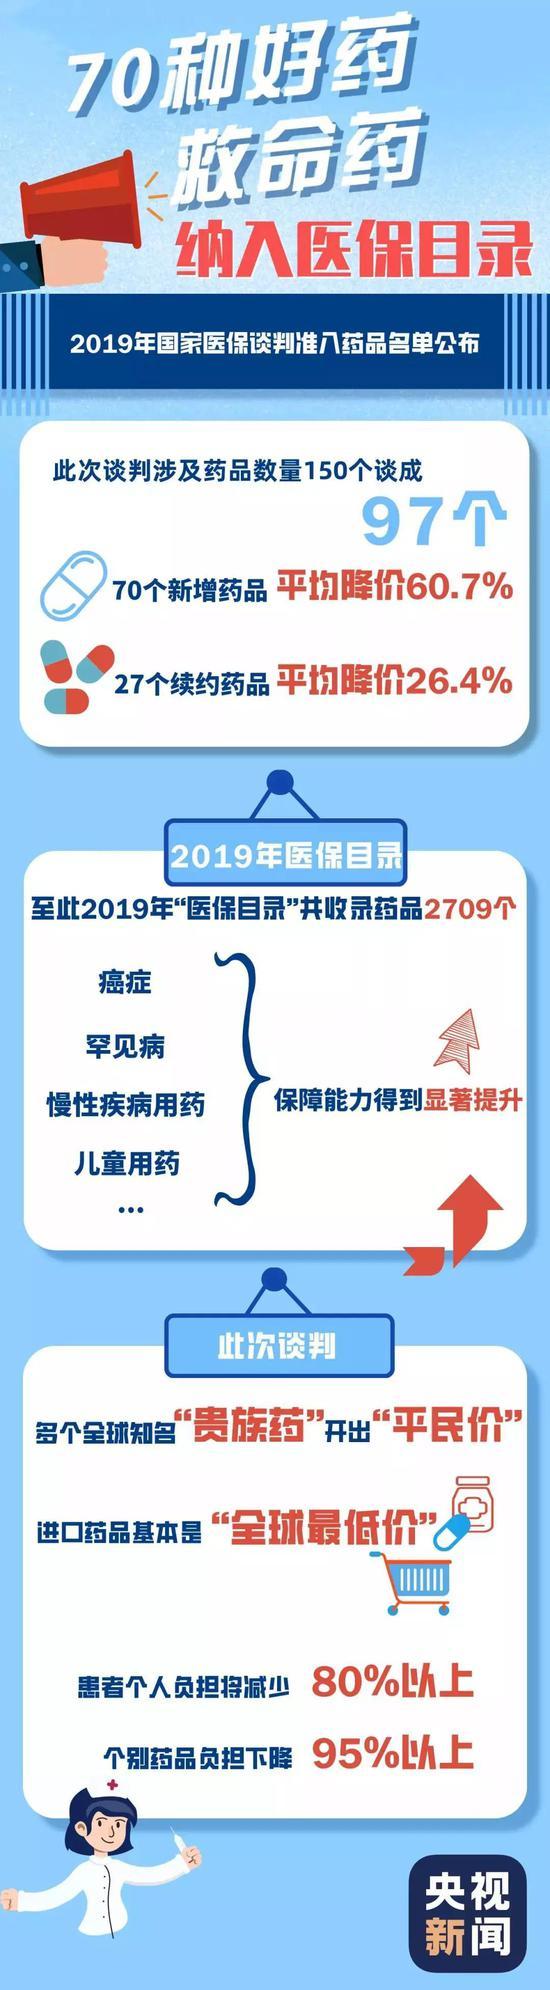 hg游戏·震惊:传中国移动2年后3G退网 电信联通看了后真的没敢笑